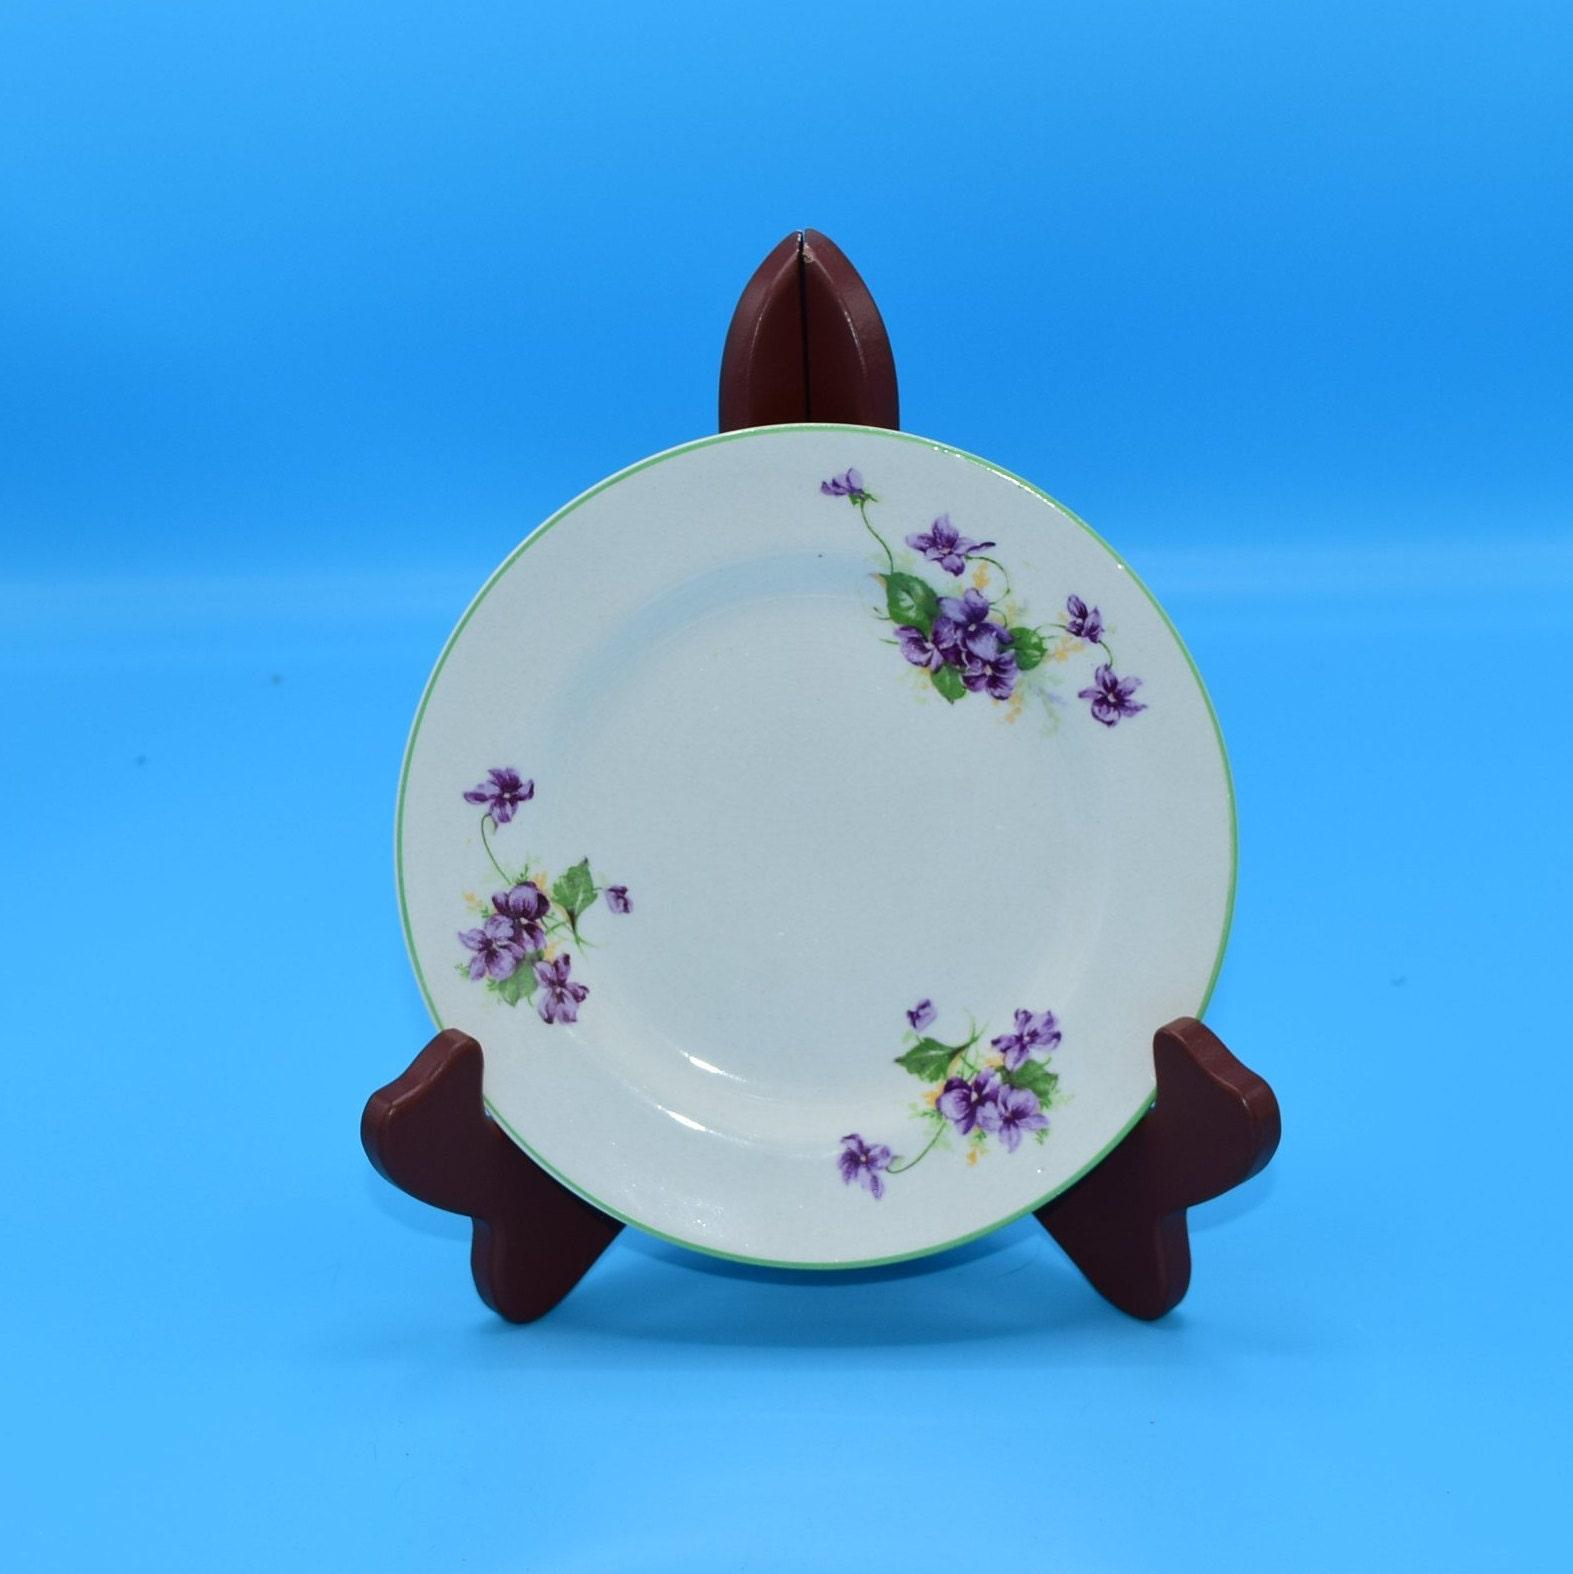 Fondeville Ambassador Ware Small Plate Vintage Purple Violets Lunch